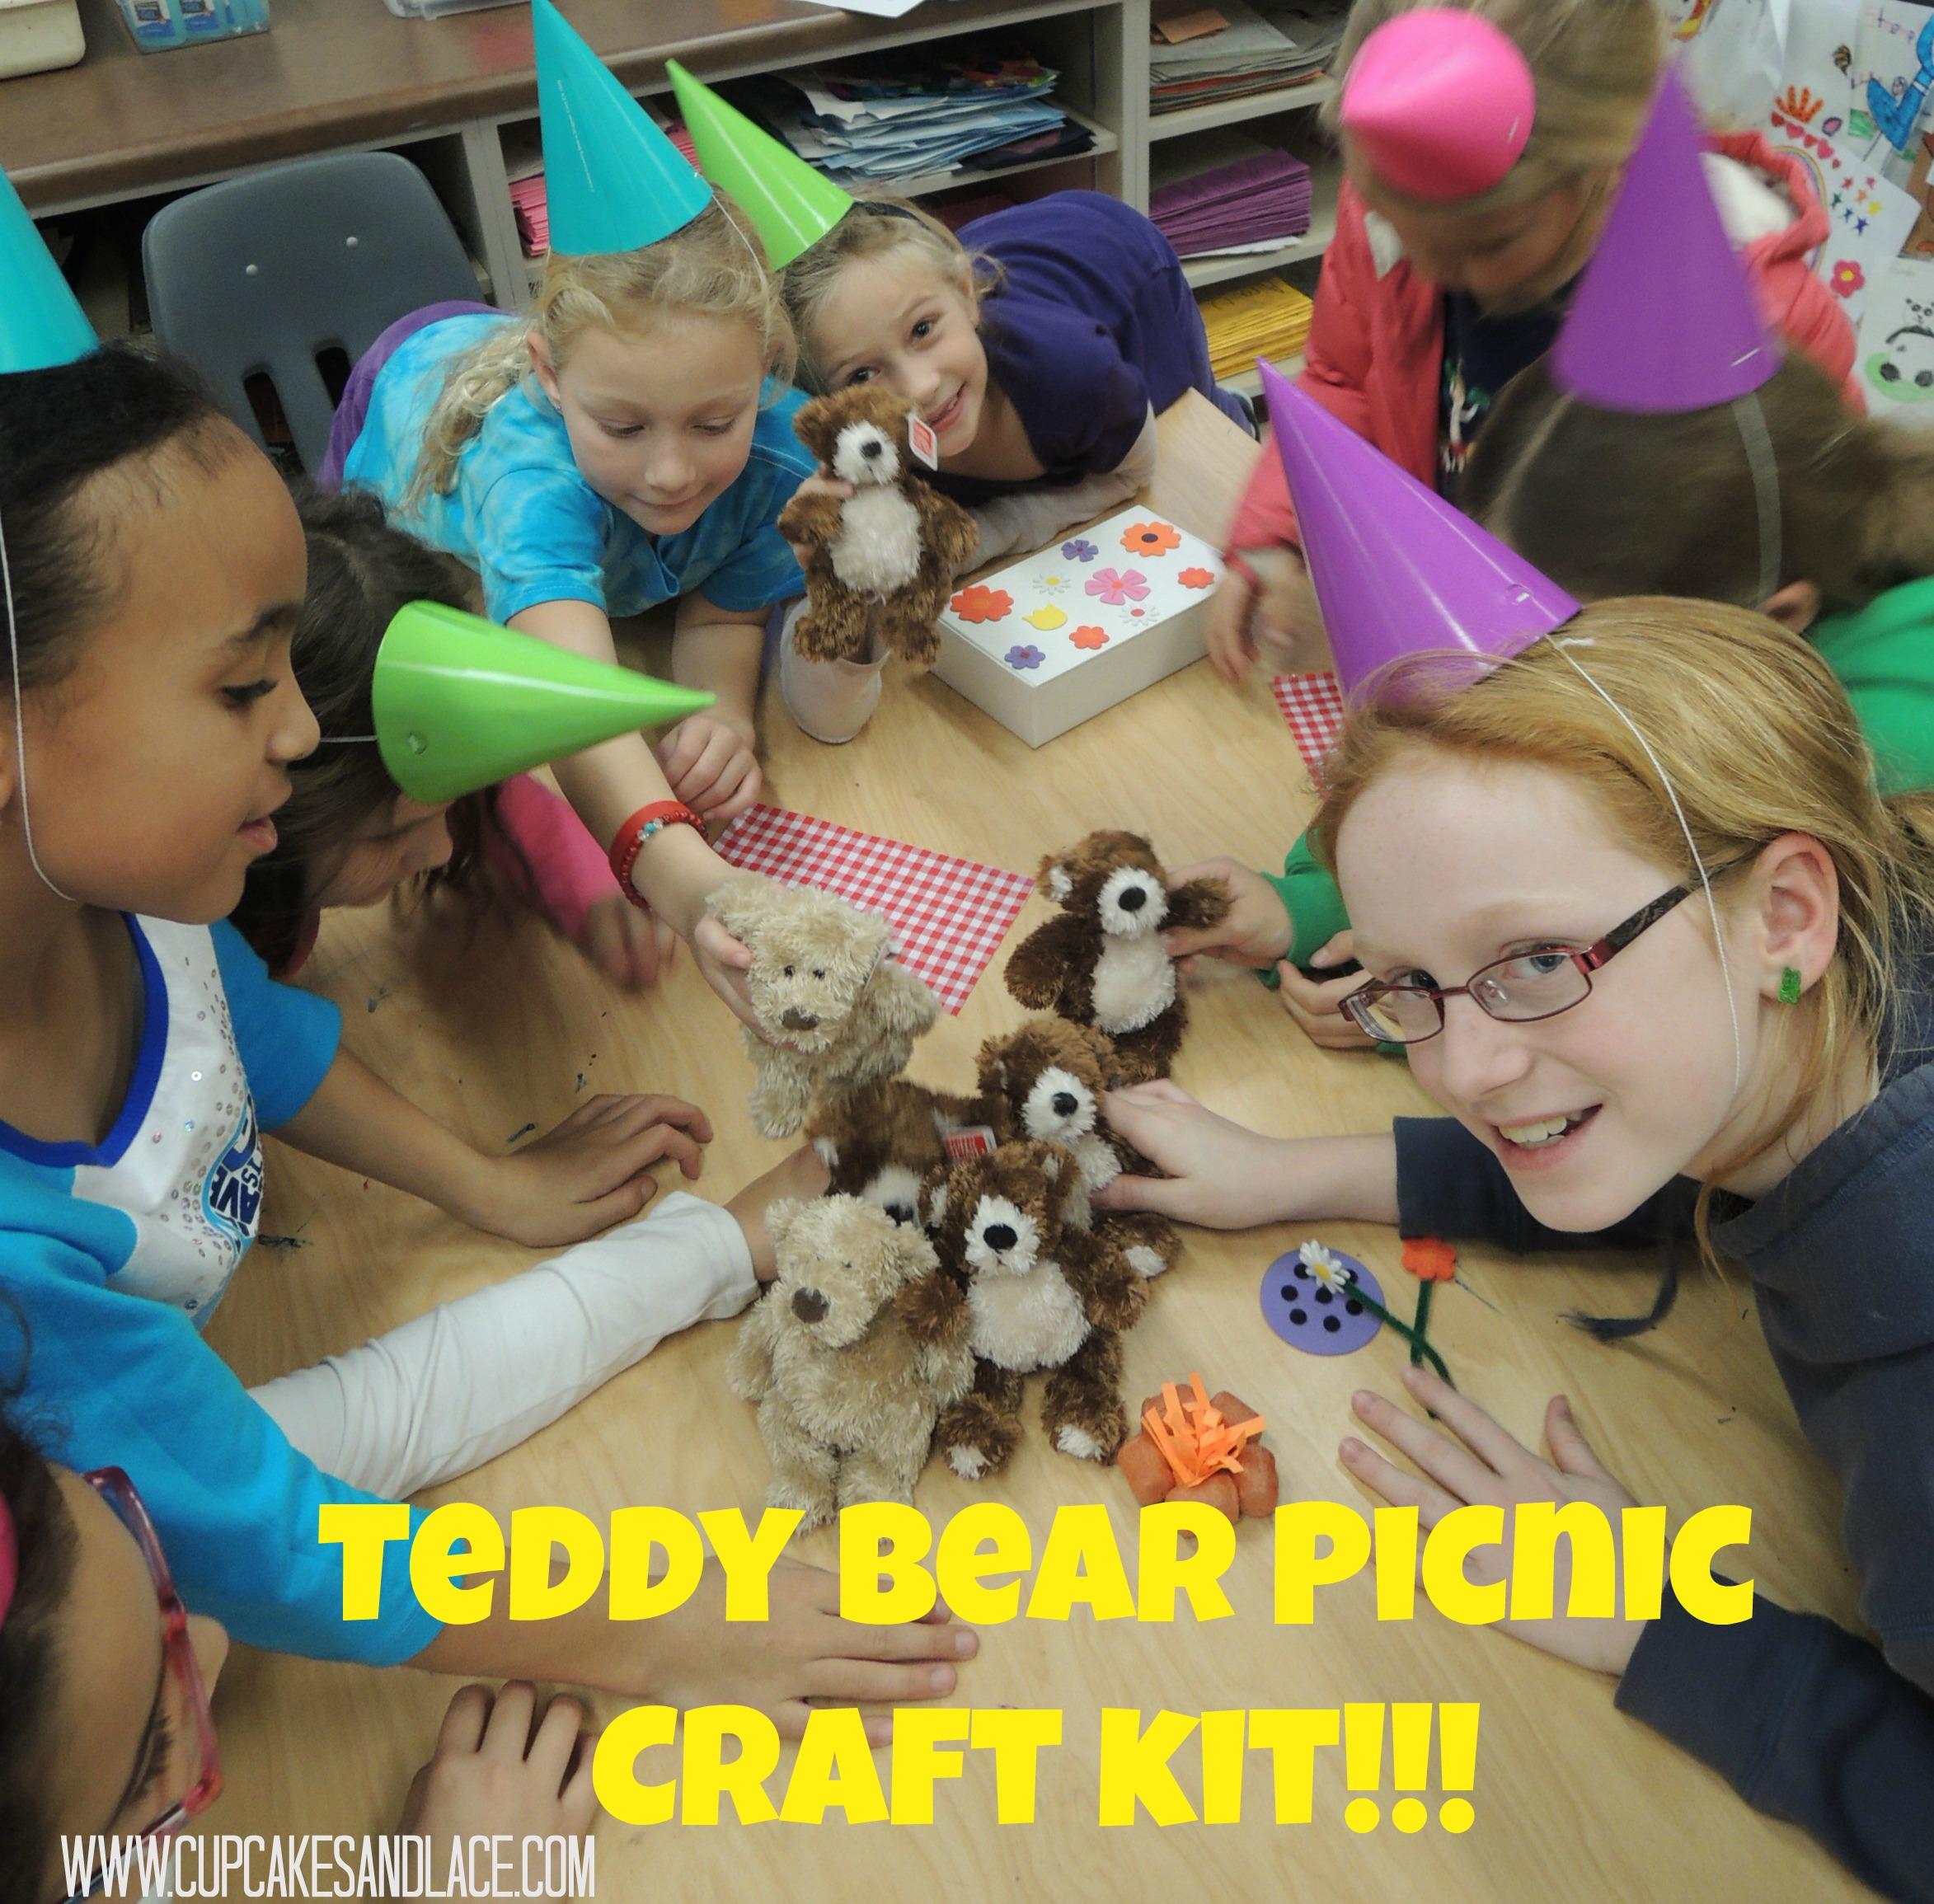 Teddy Bear Picnic Crafting Kit Fun Birthday Party Craft